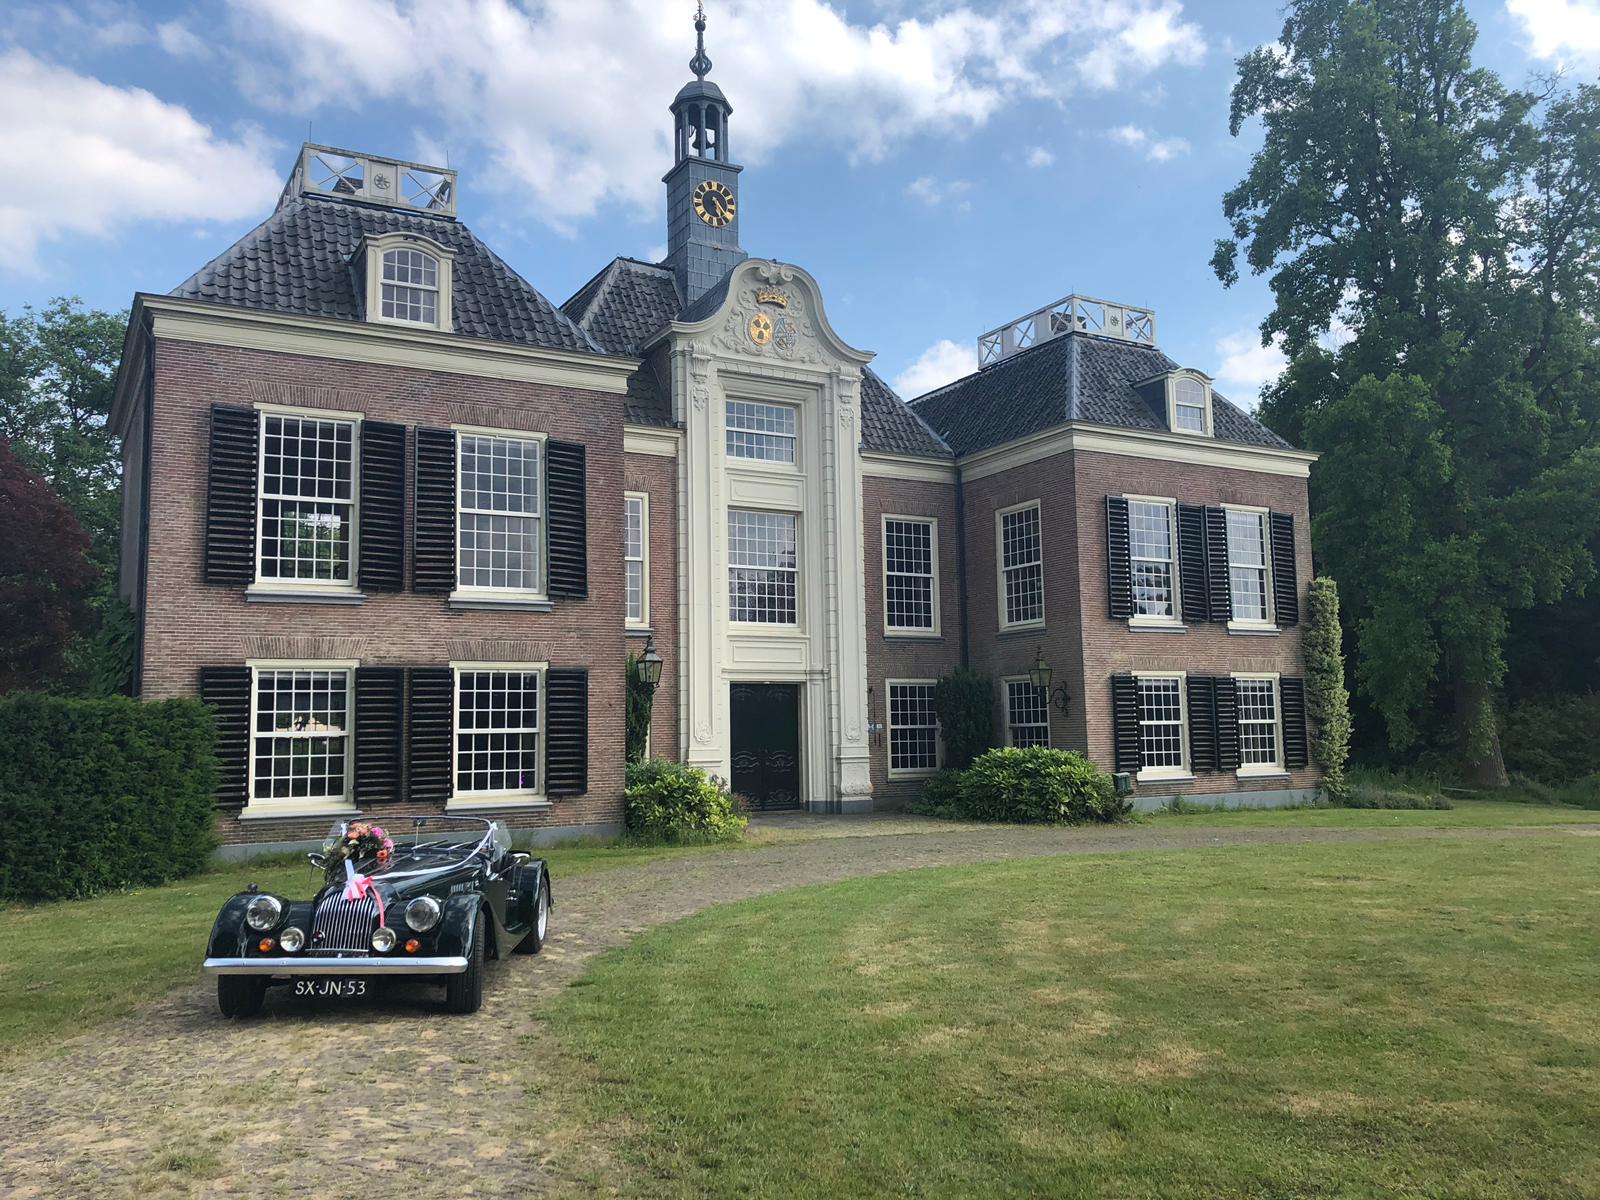 Huis 't Joppe - Locaties - Boenders Catering